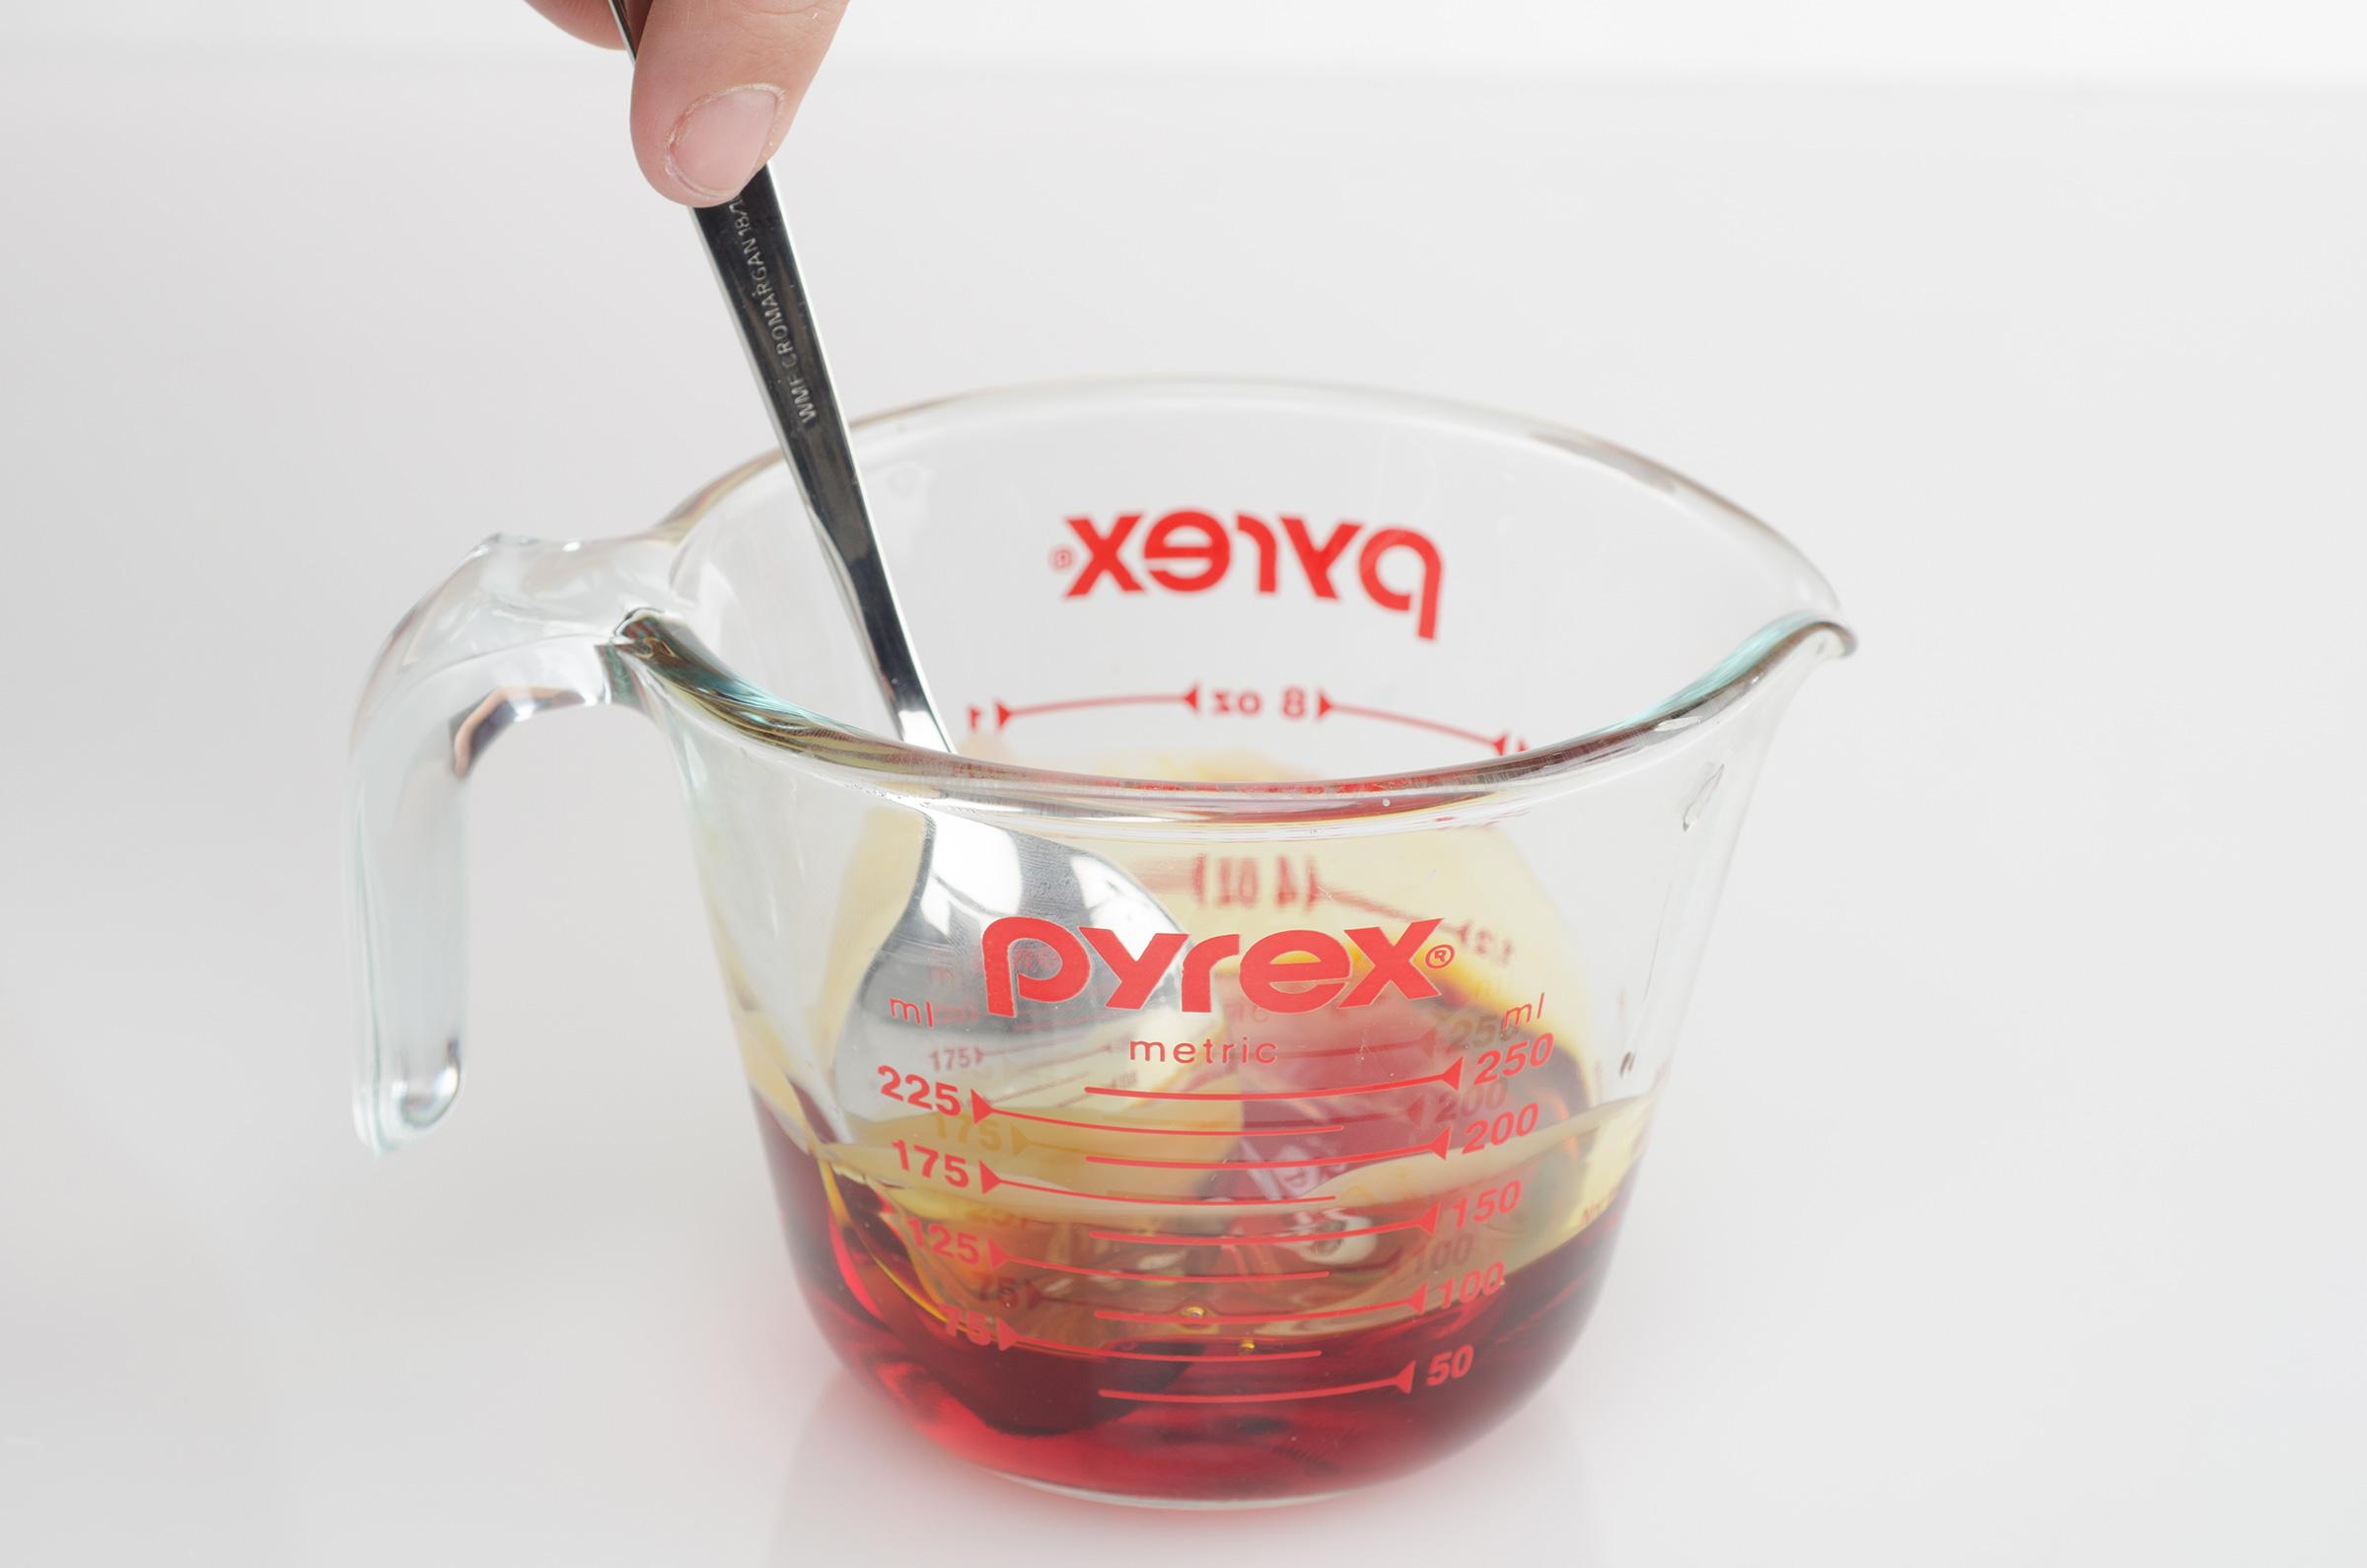 stir fragrance oil into wax